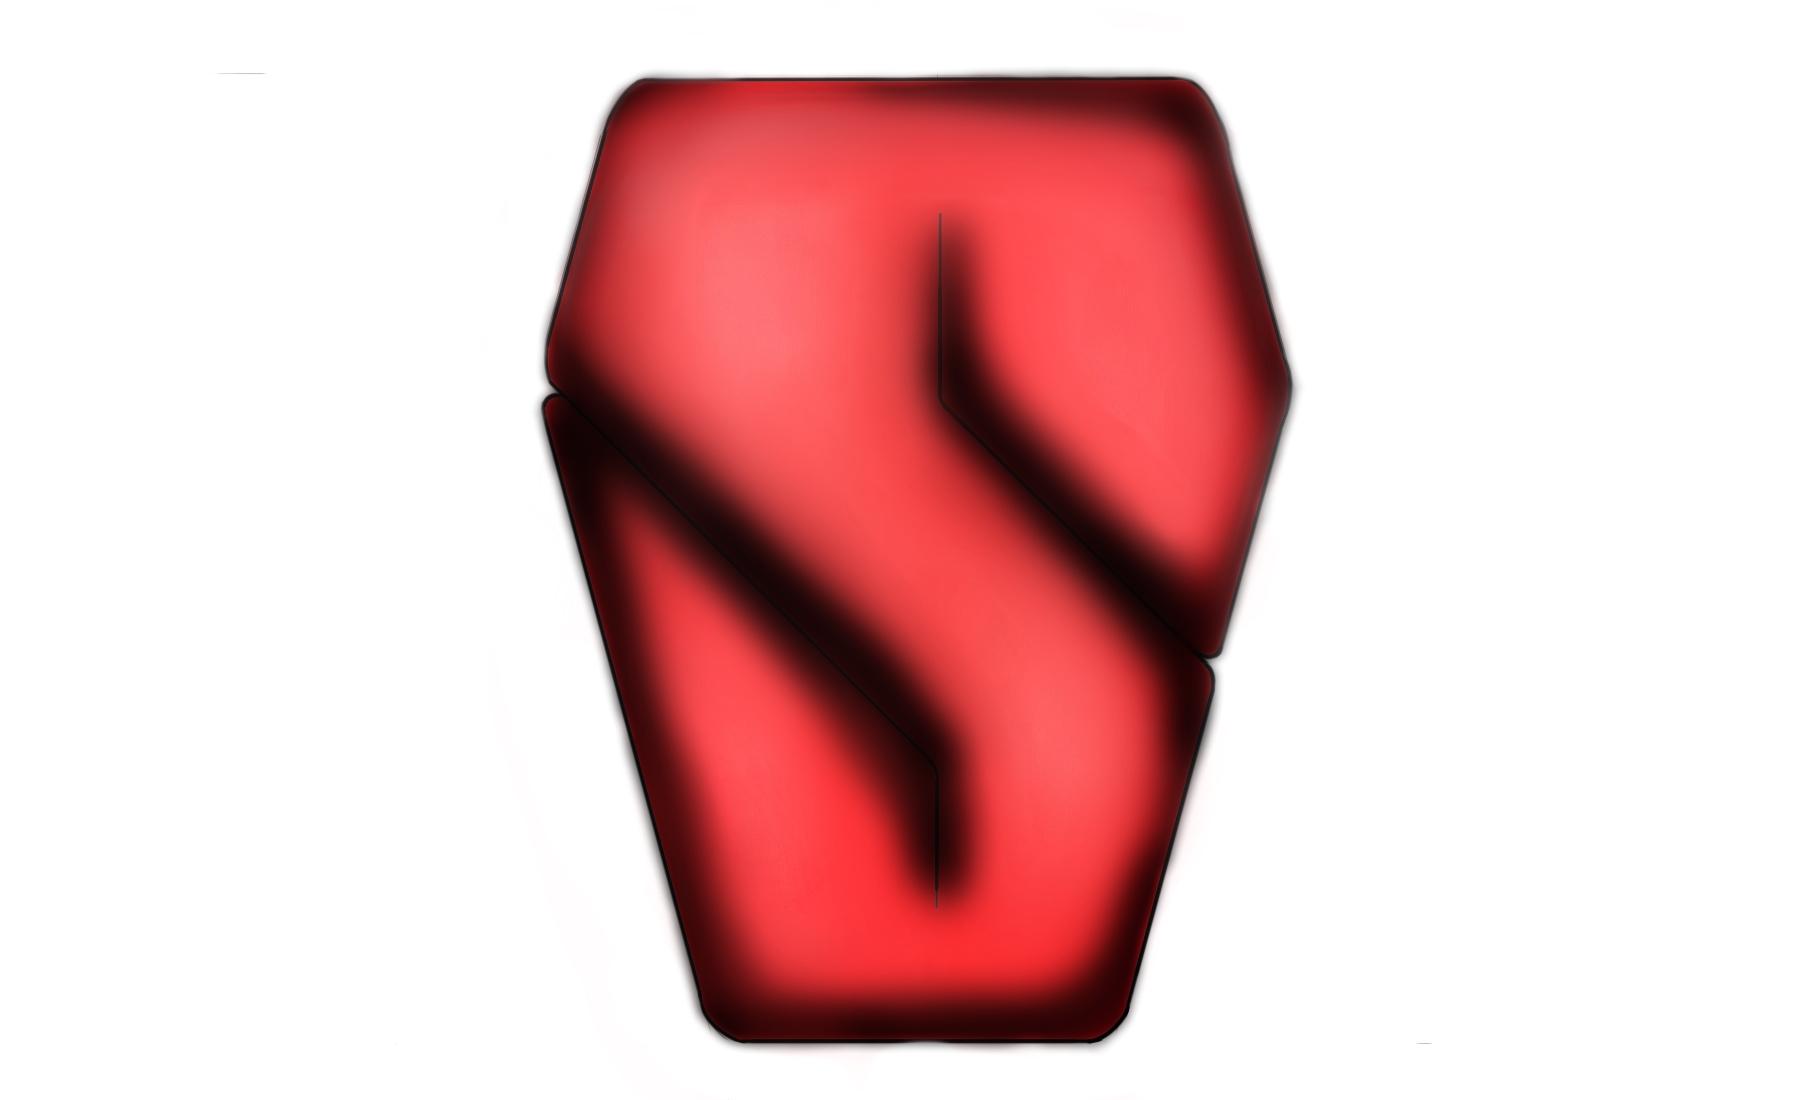 Разработать логотип для вездехода фото f_6545f8805827441a.jpg